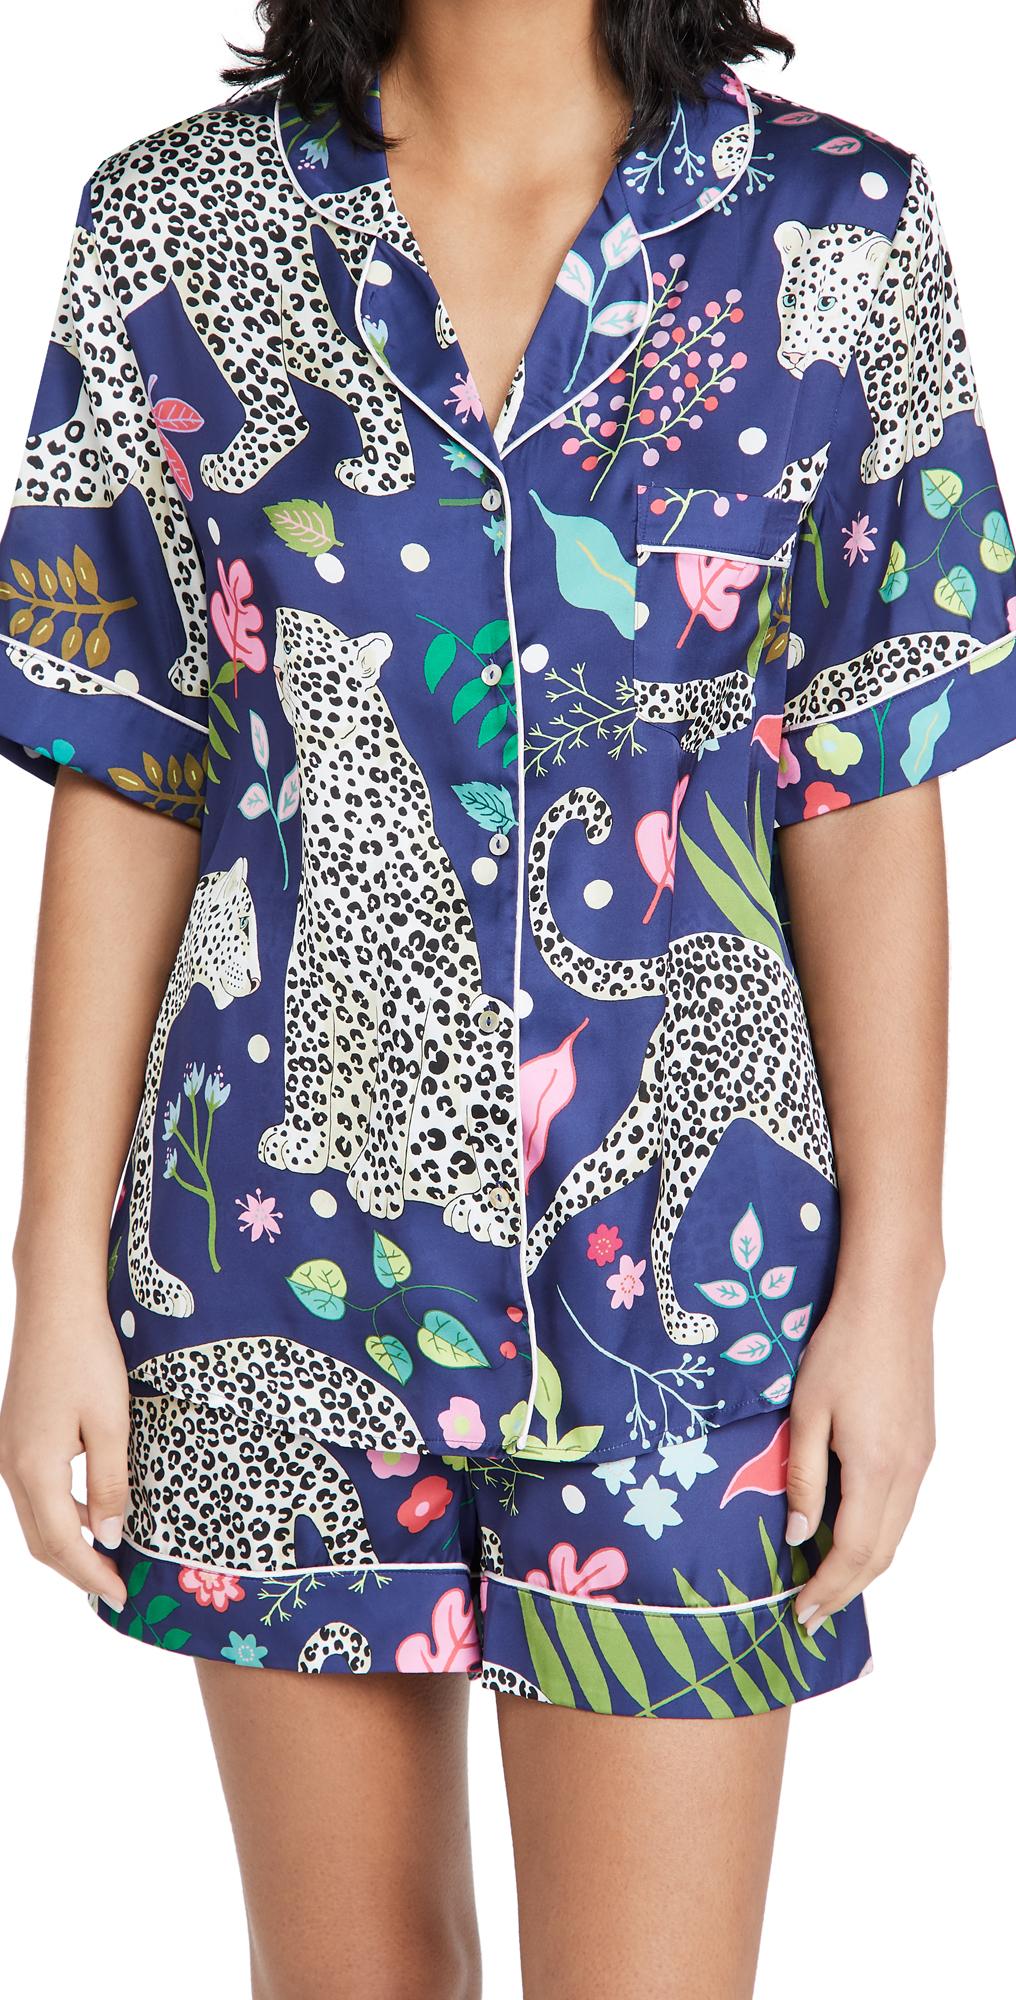 Snow Leopard Short Pajama Set